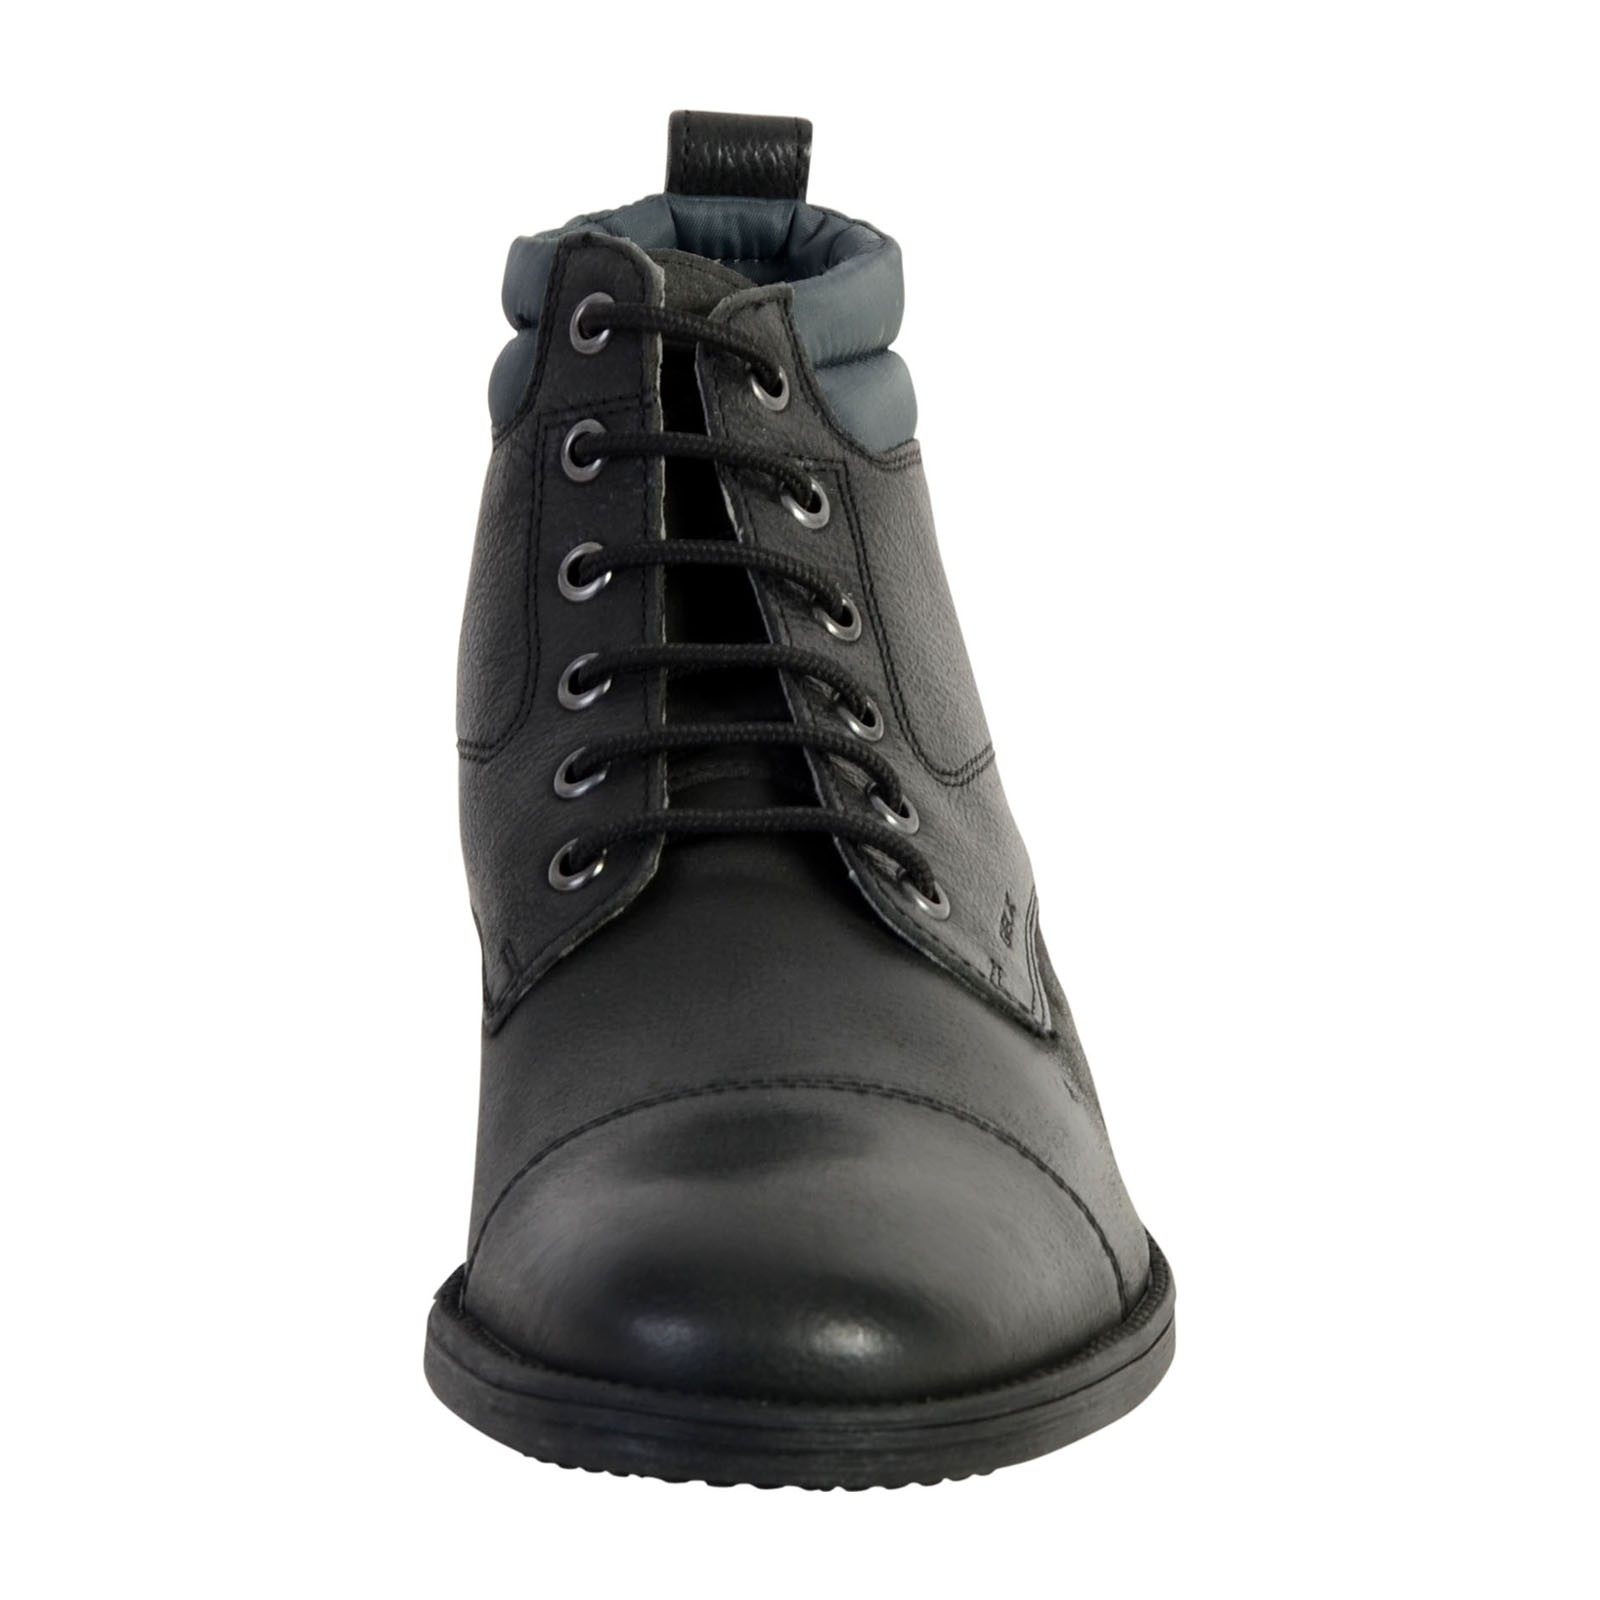 Geox Chaussures U D Jaylon Geox Chaussures x6TYqwY8v